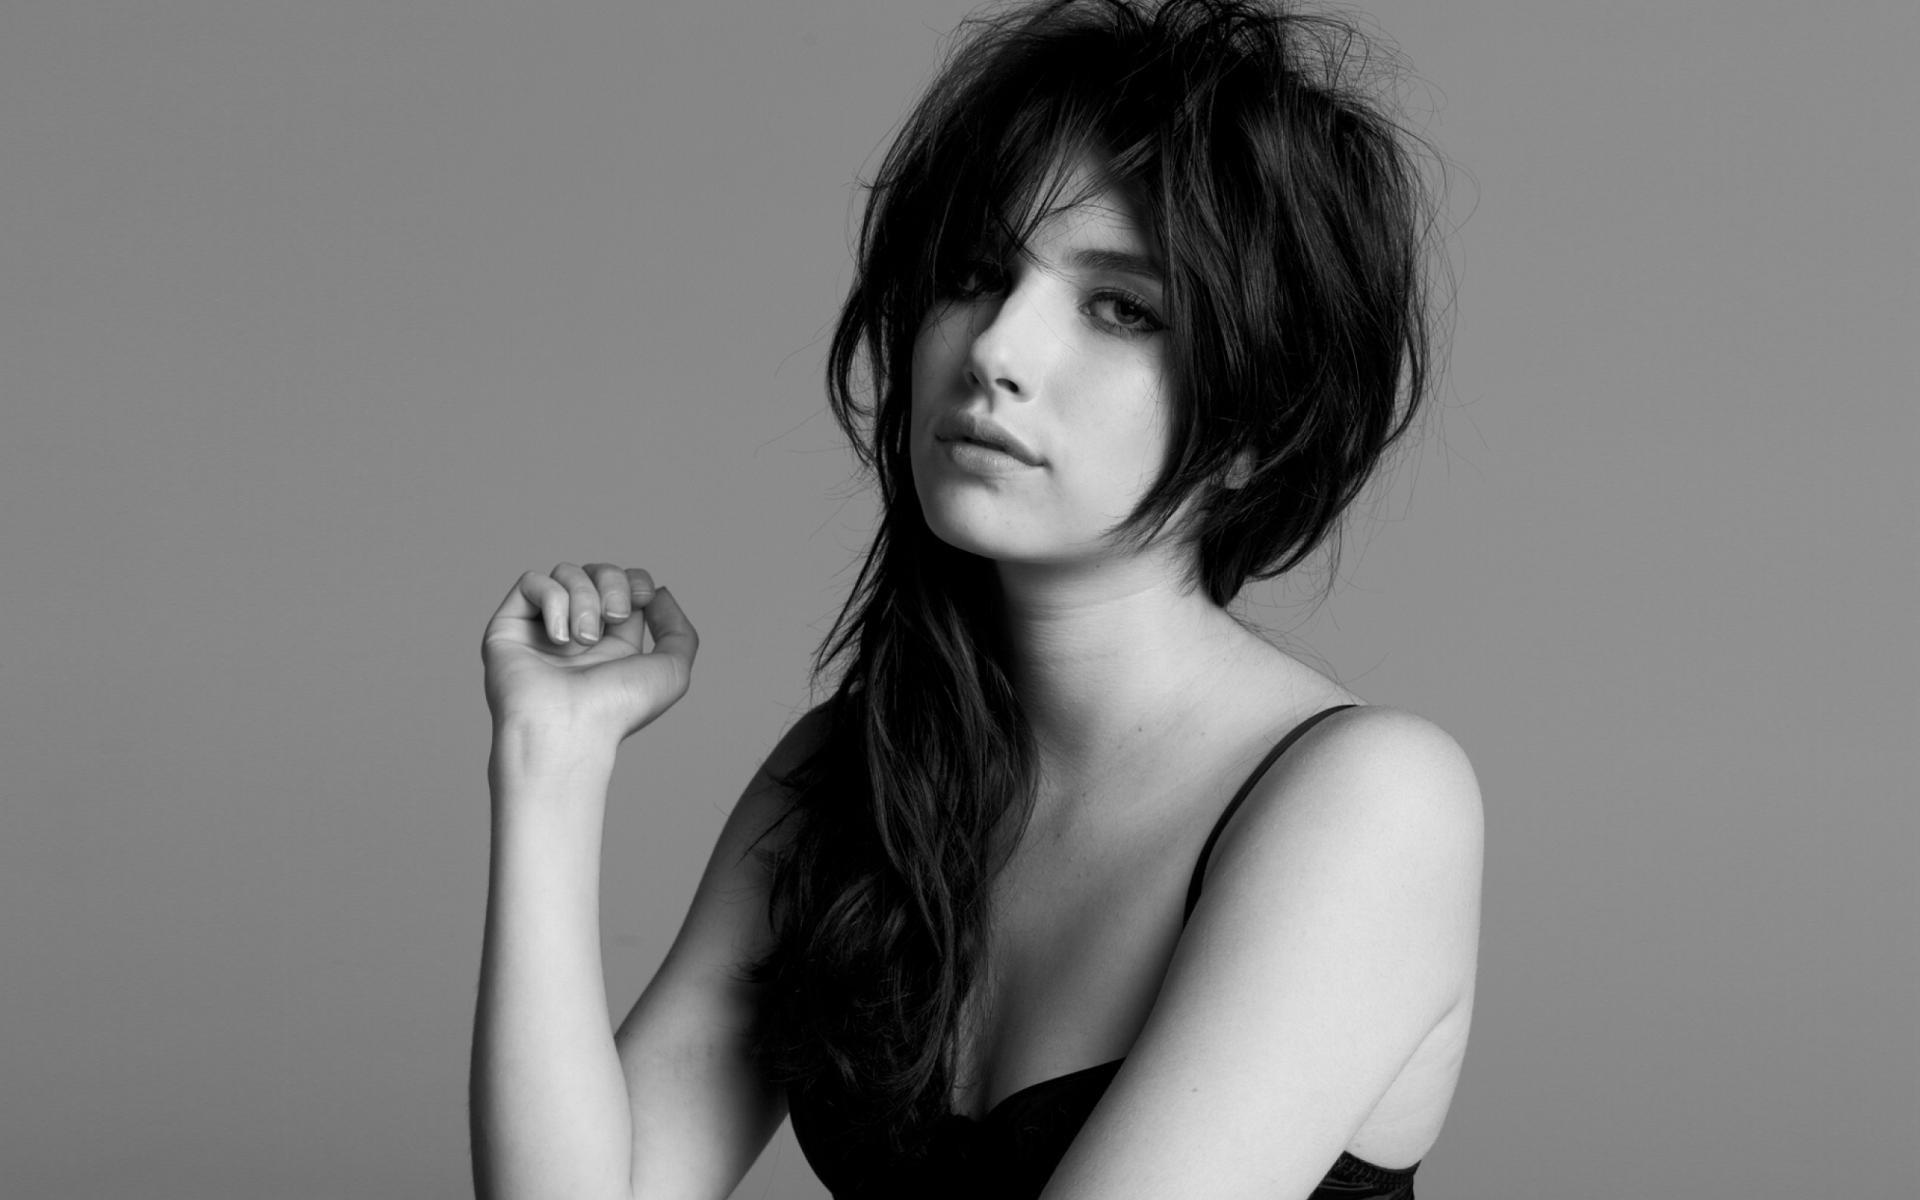 Wallpaper menghadapi satu warna model rambut panjang si rambut coklat rambut hitam Orang kepala supermodel Emma Roberts gadis keindahan mata